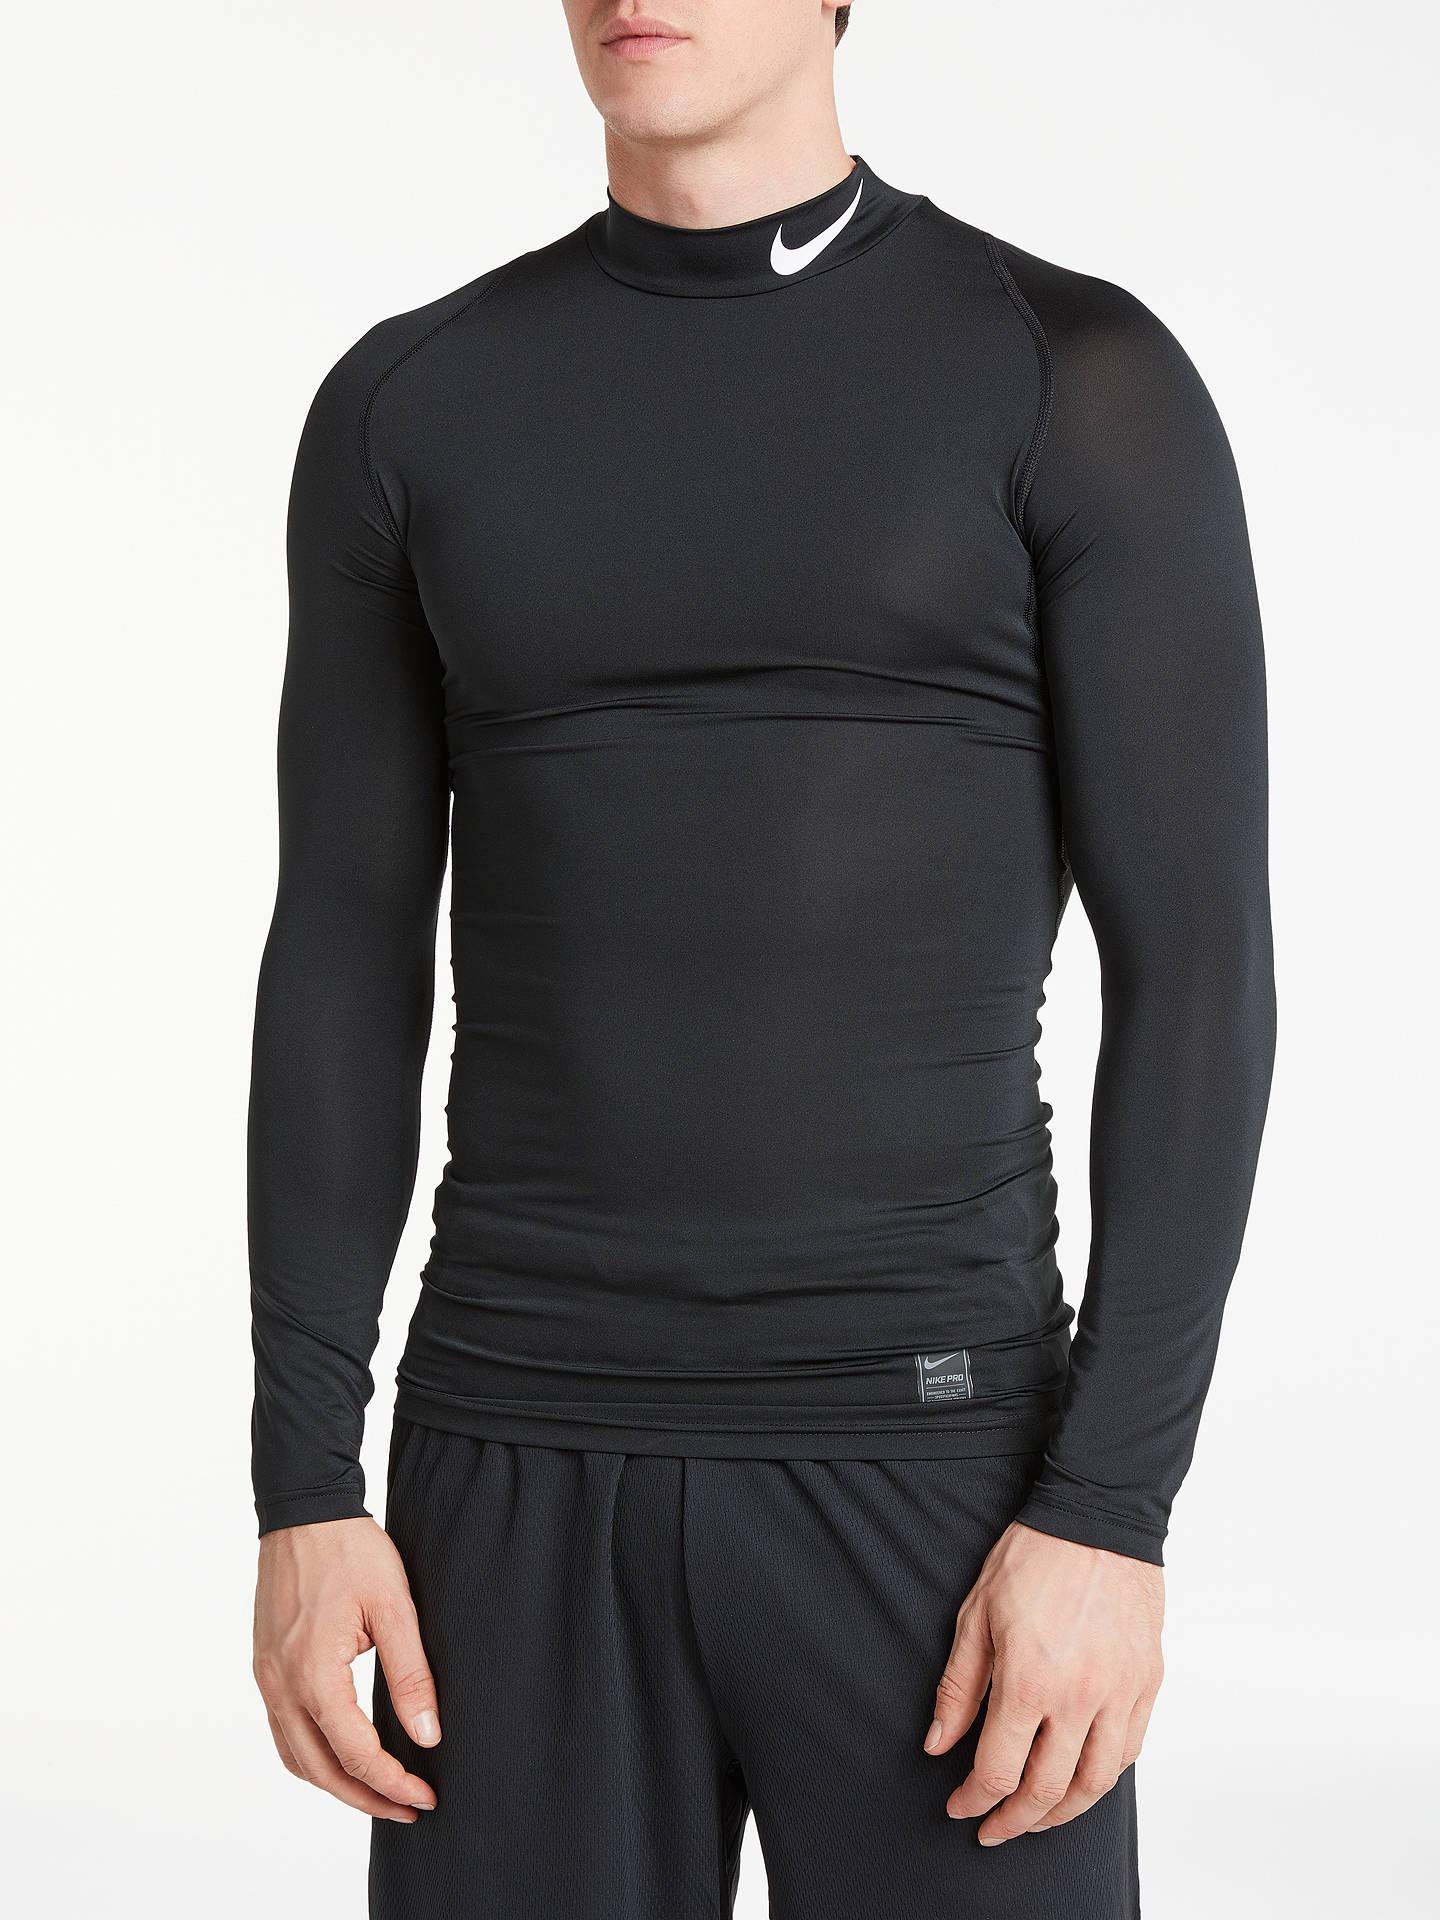 bd20c63a Buy Nike Pro Long Sleeve Training Top, Black/White, S Online at johnlewis  ...